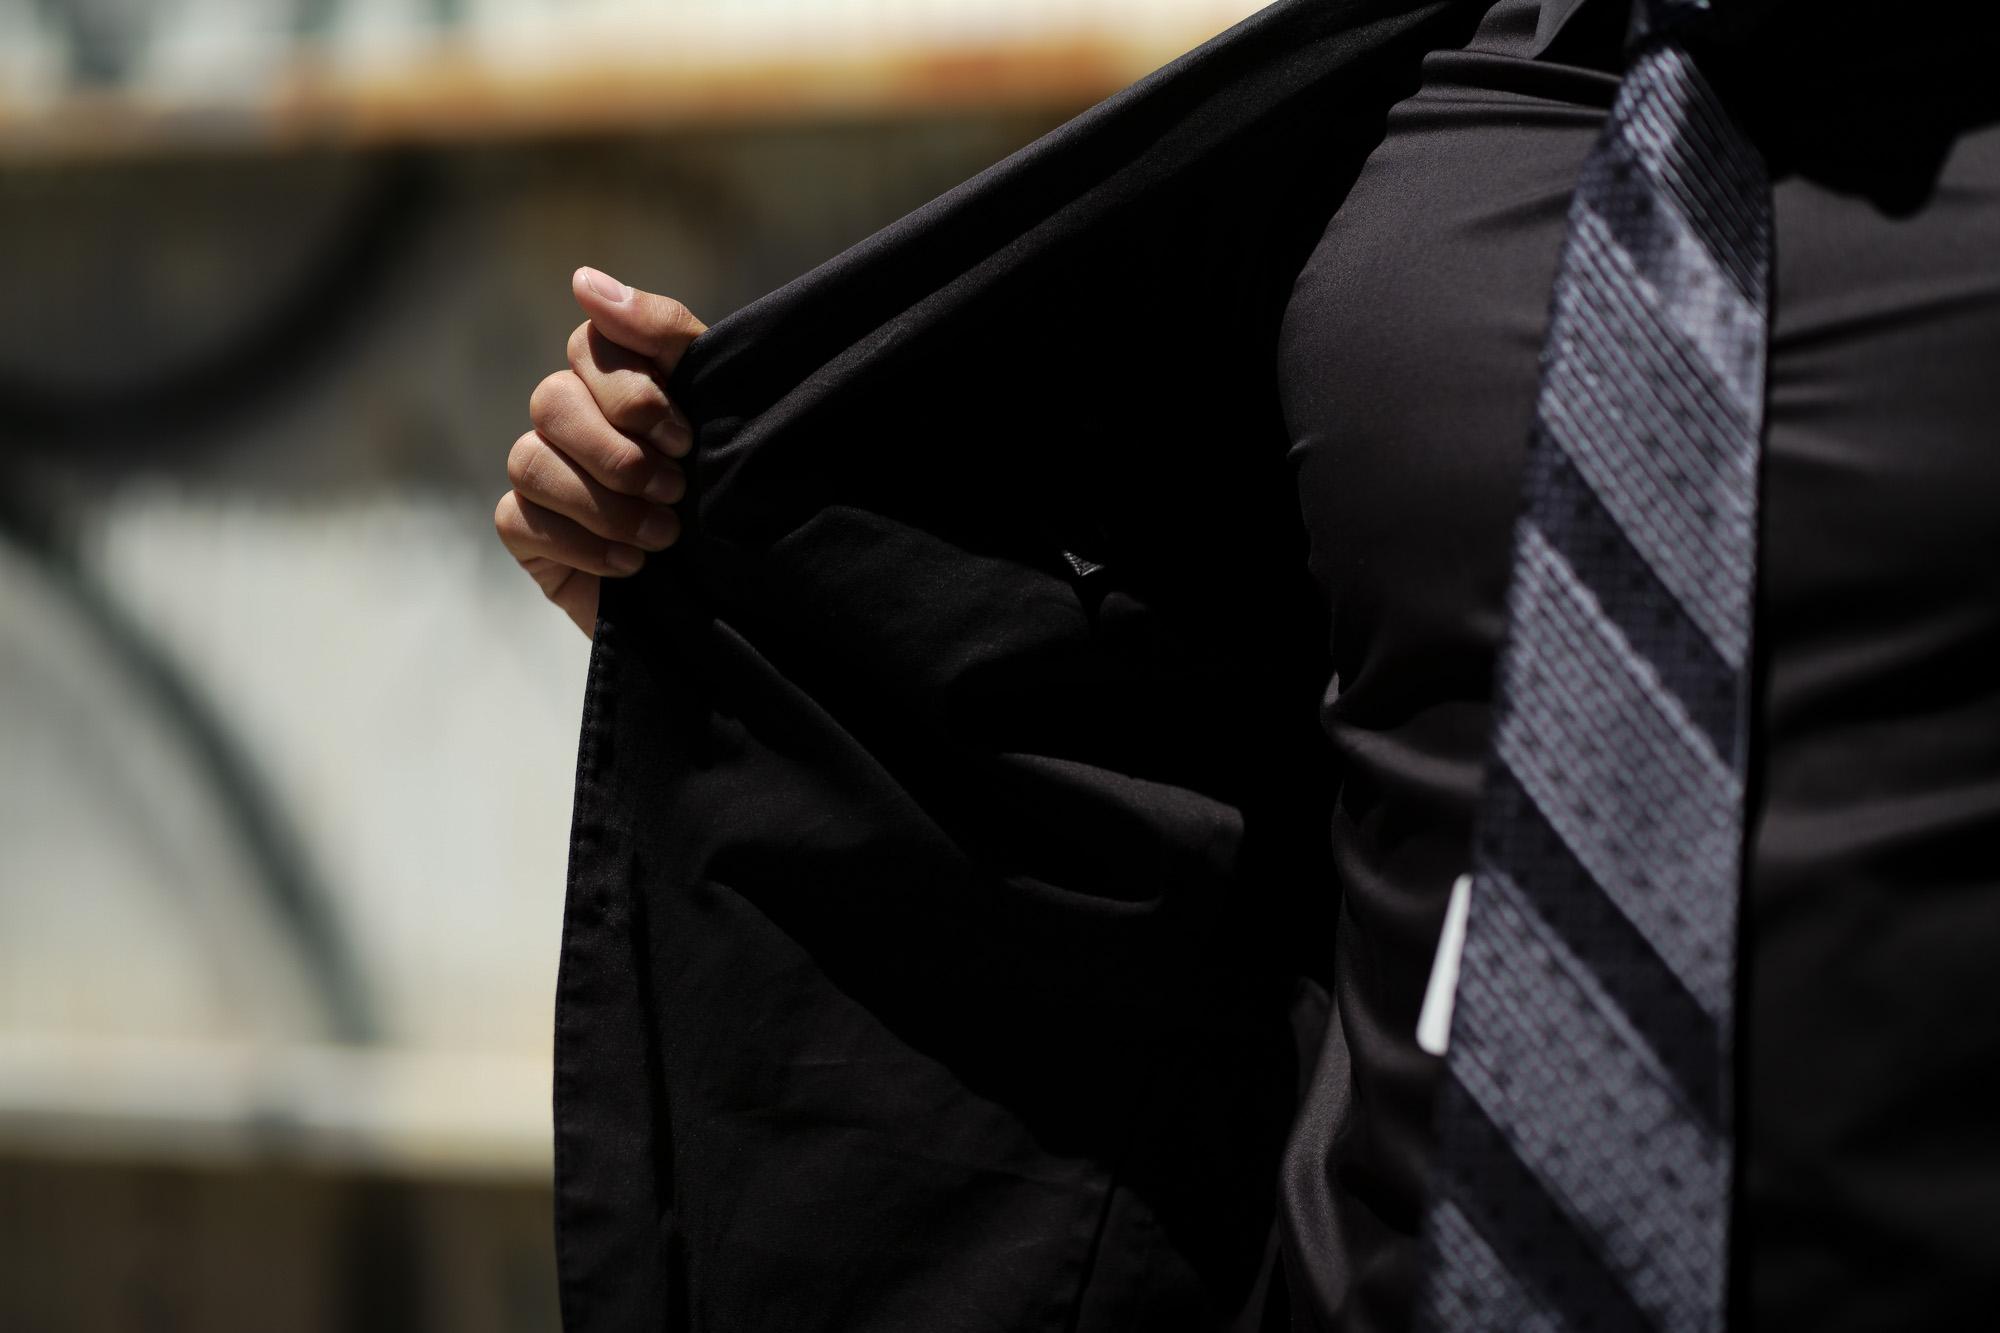 Cuervo (クエルボ) Sartoria Collection (サルトリア コレクション) Rooster (ルースター) ストレッチコットン スーツ BLACK (ブラック) MADE IN JAPAN (日本製) 2019 春夏新作 【ご予約受付中】愛知 名古屋 alto e diritto アルトエデリット